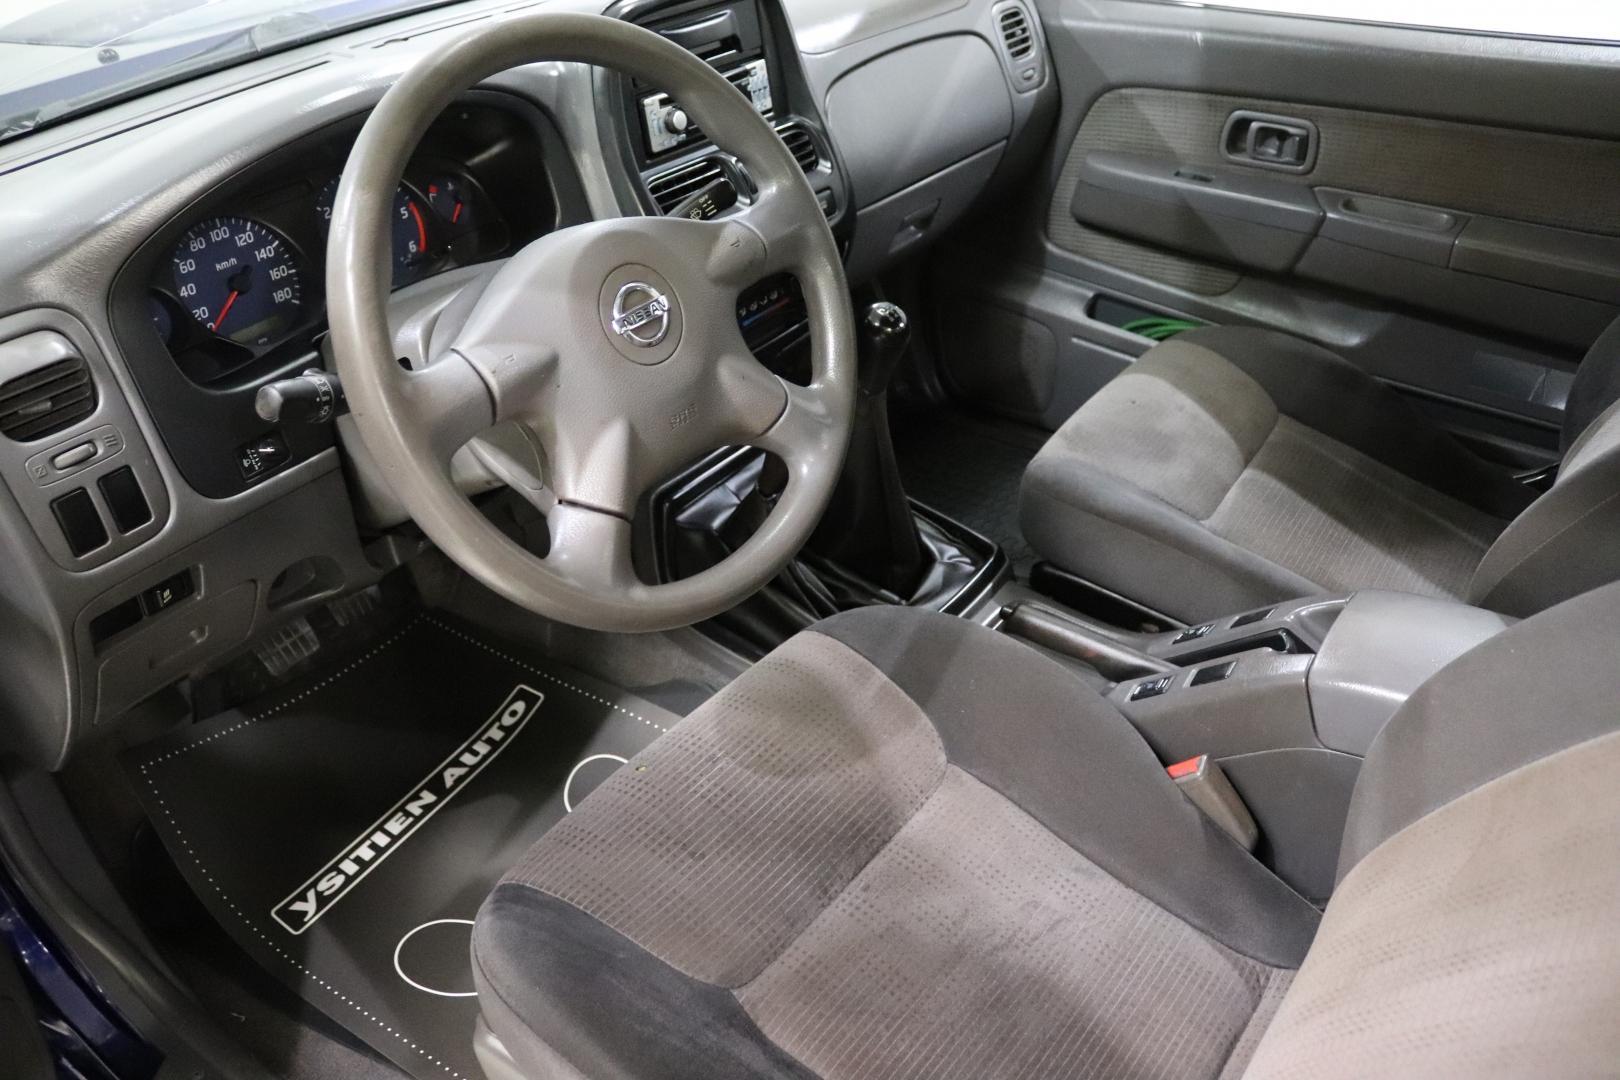 Nissan Pickup, 2.5 Di 4wd SIS. ALV 24 %